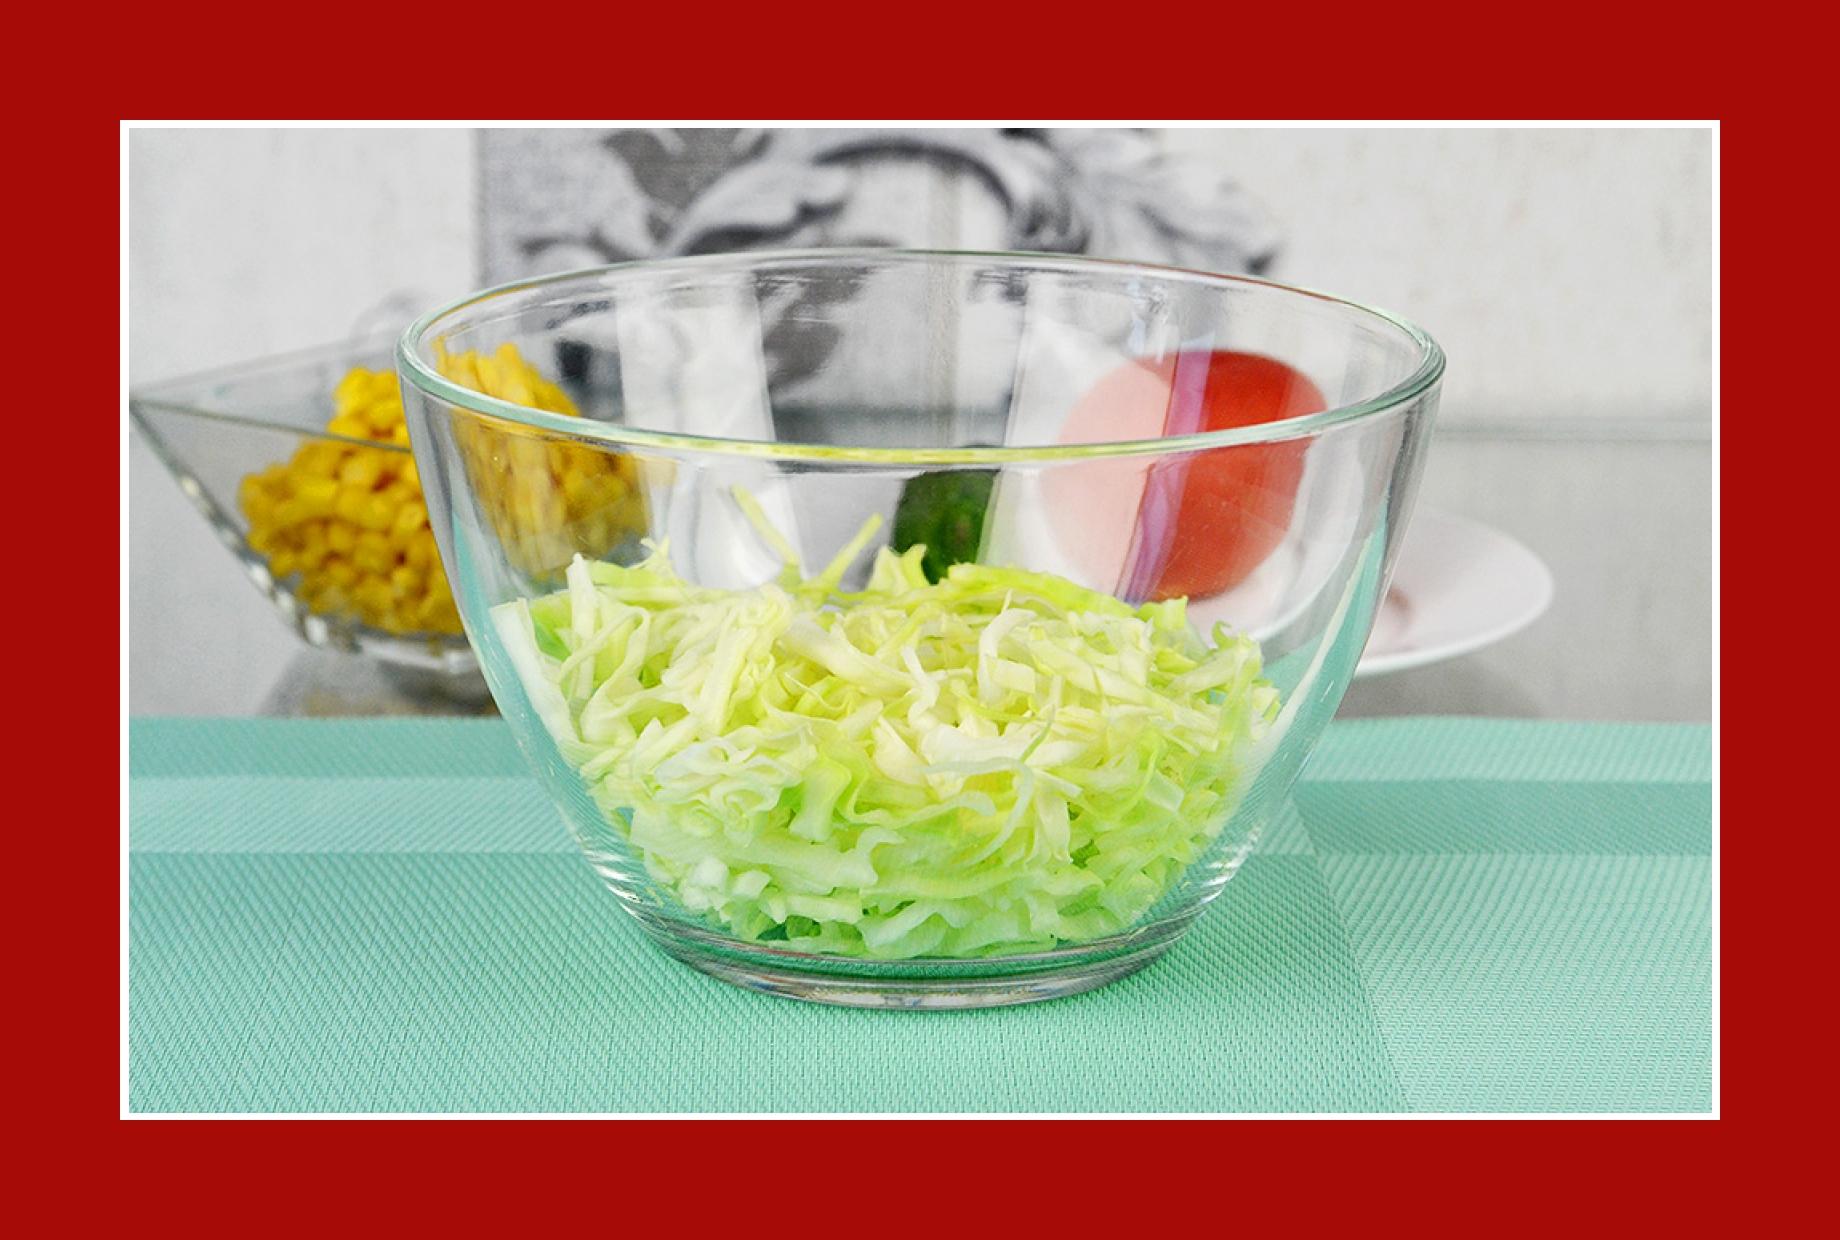 Grillsalat Tomatensalat mit Kohl